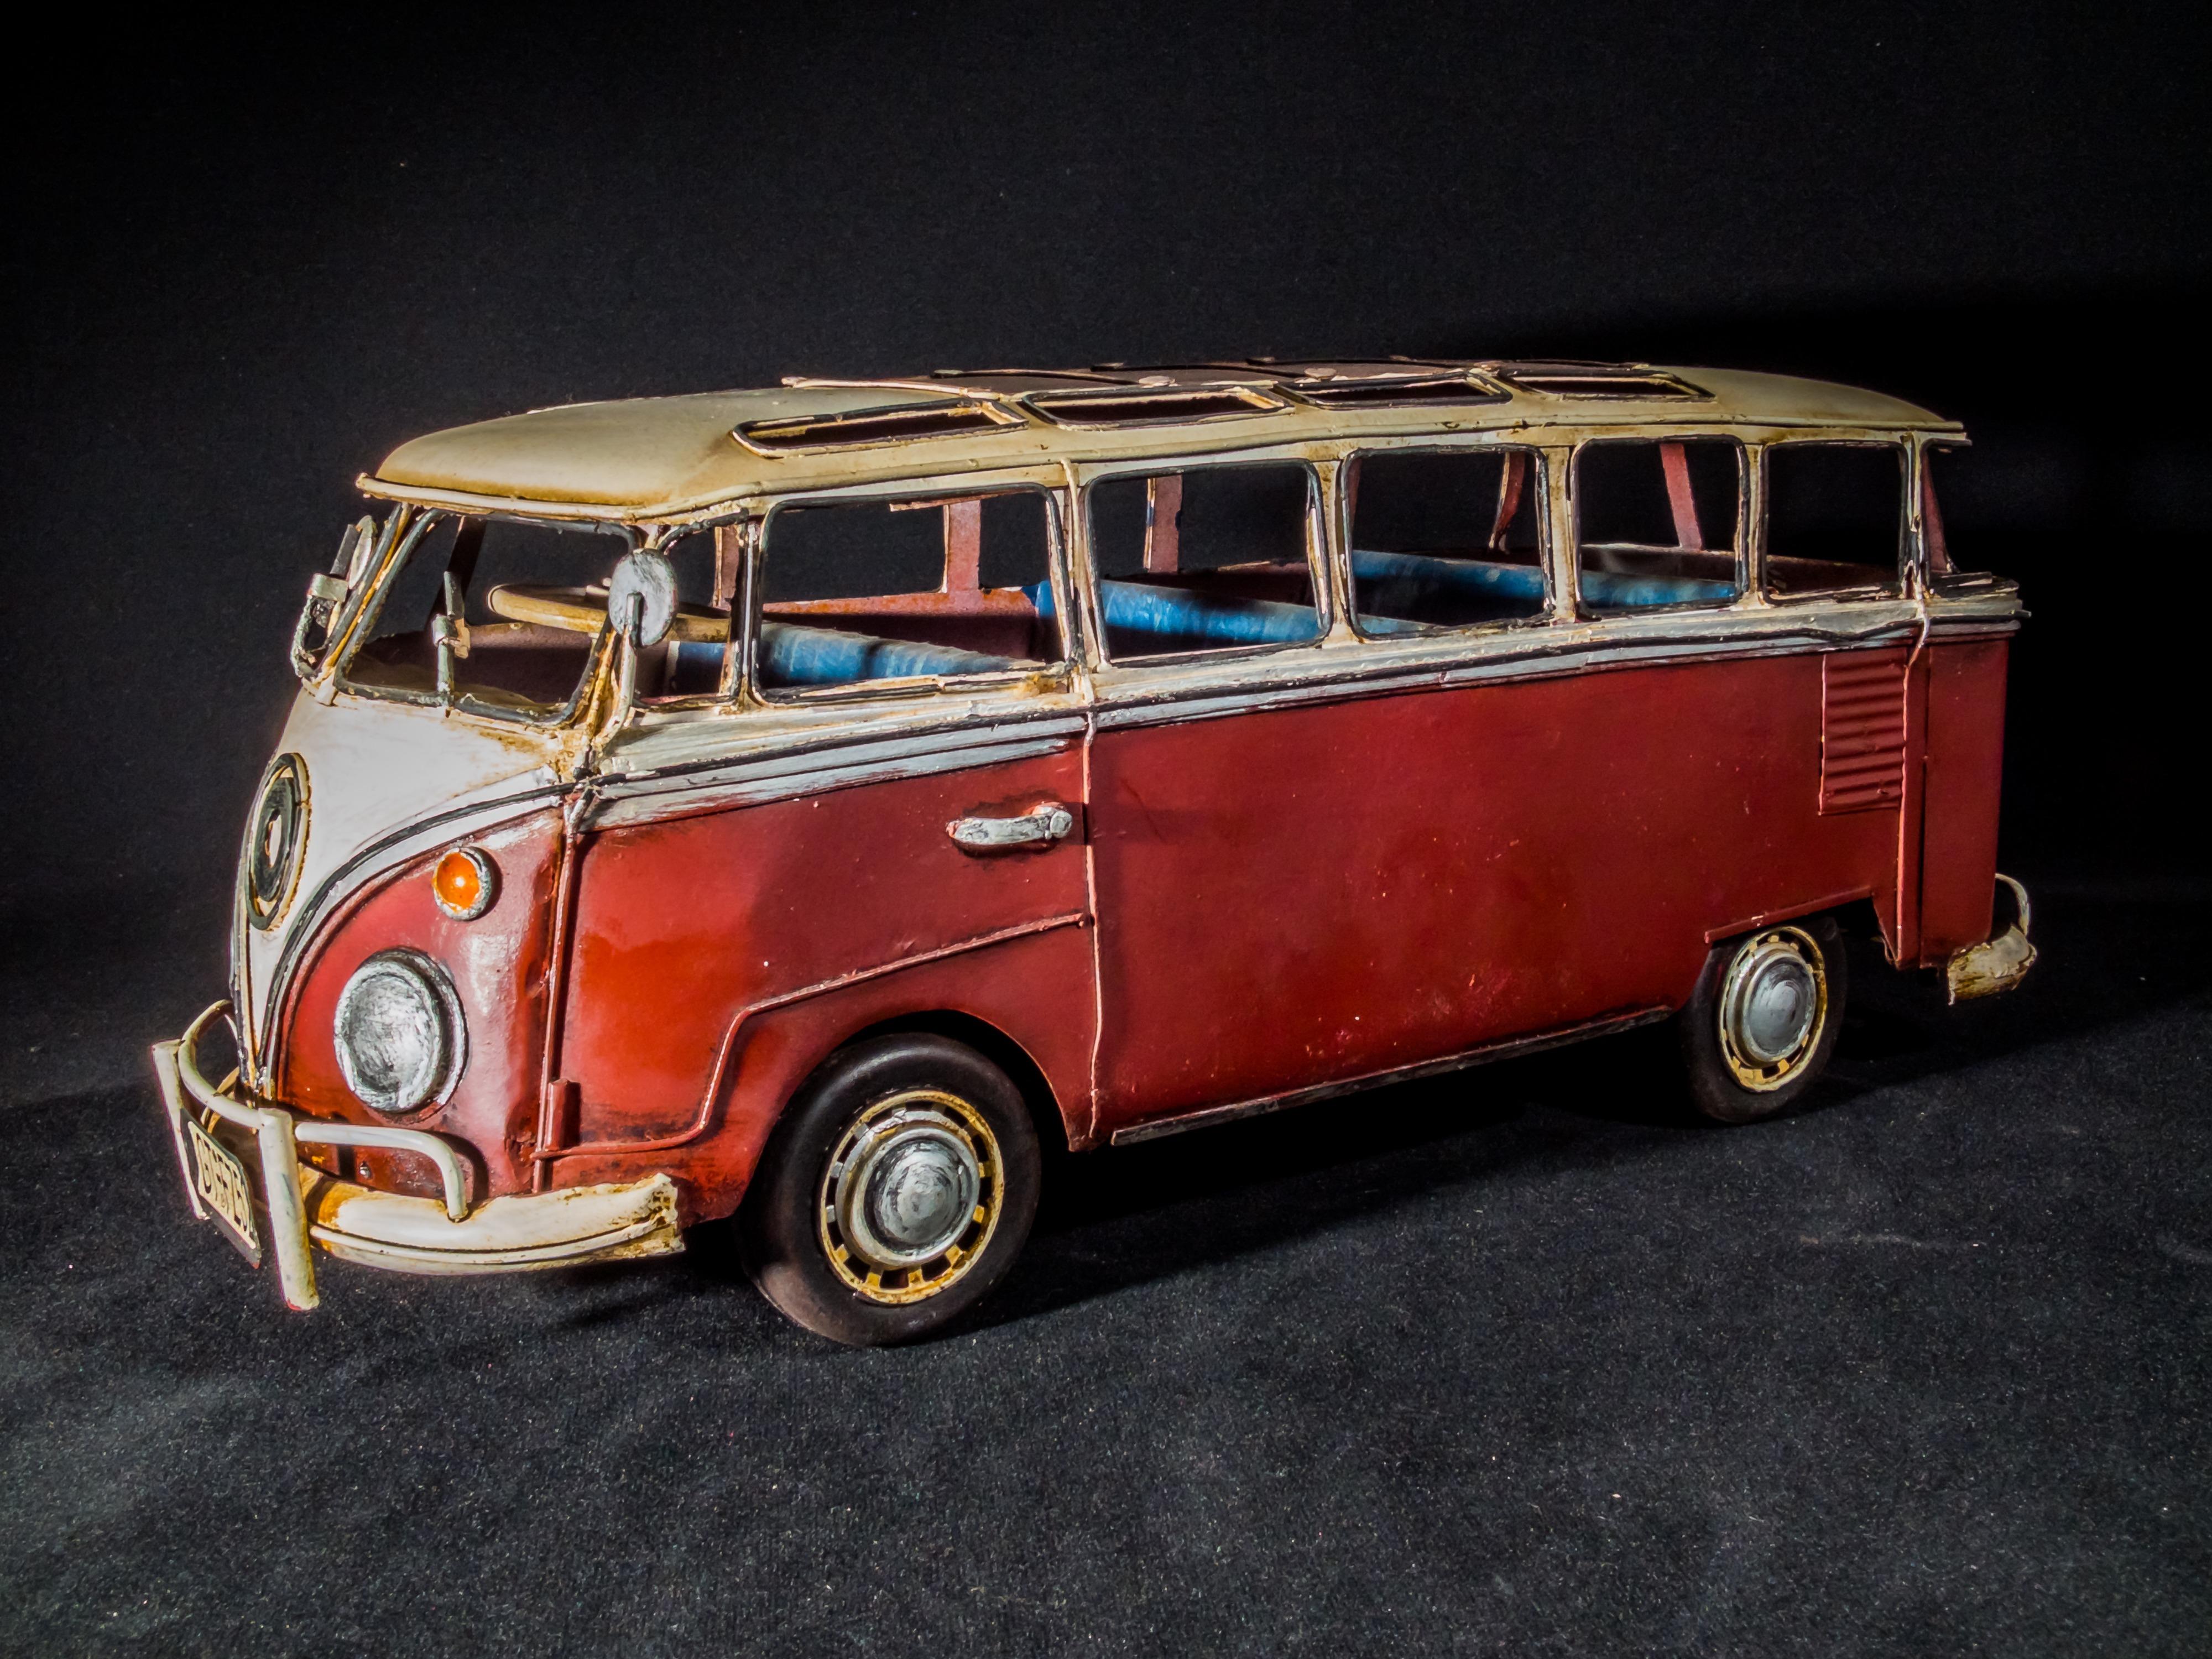 manuals vw red assembled s pre p lego van instruction volkswagen preassembled bus camper